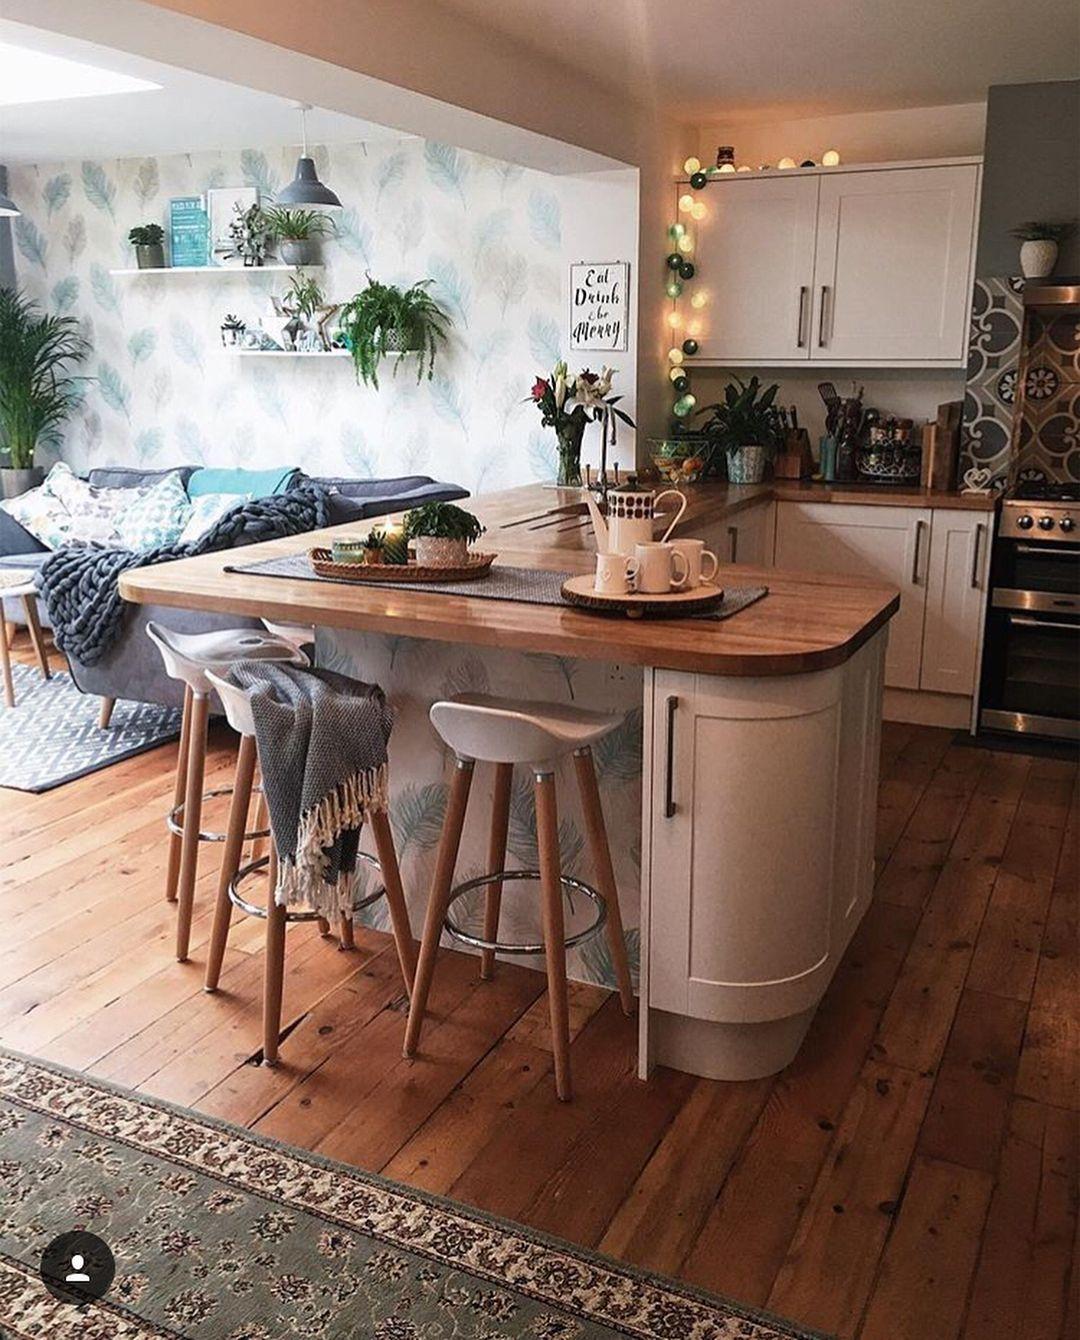 Day 6 of Kitchen Inspo Wee   Open plan kitchen living room, Living room kitchen, Kitchen living